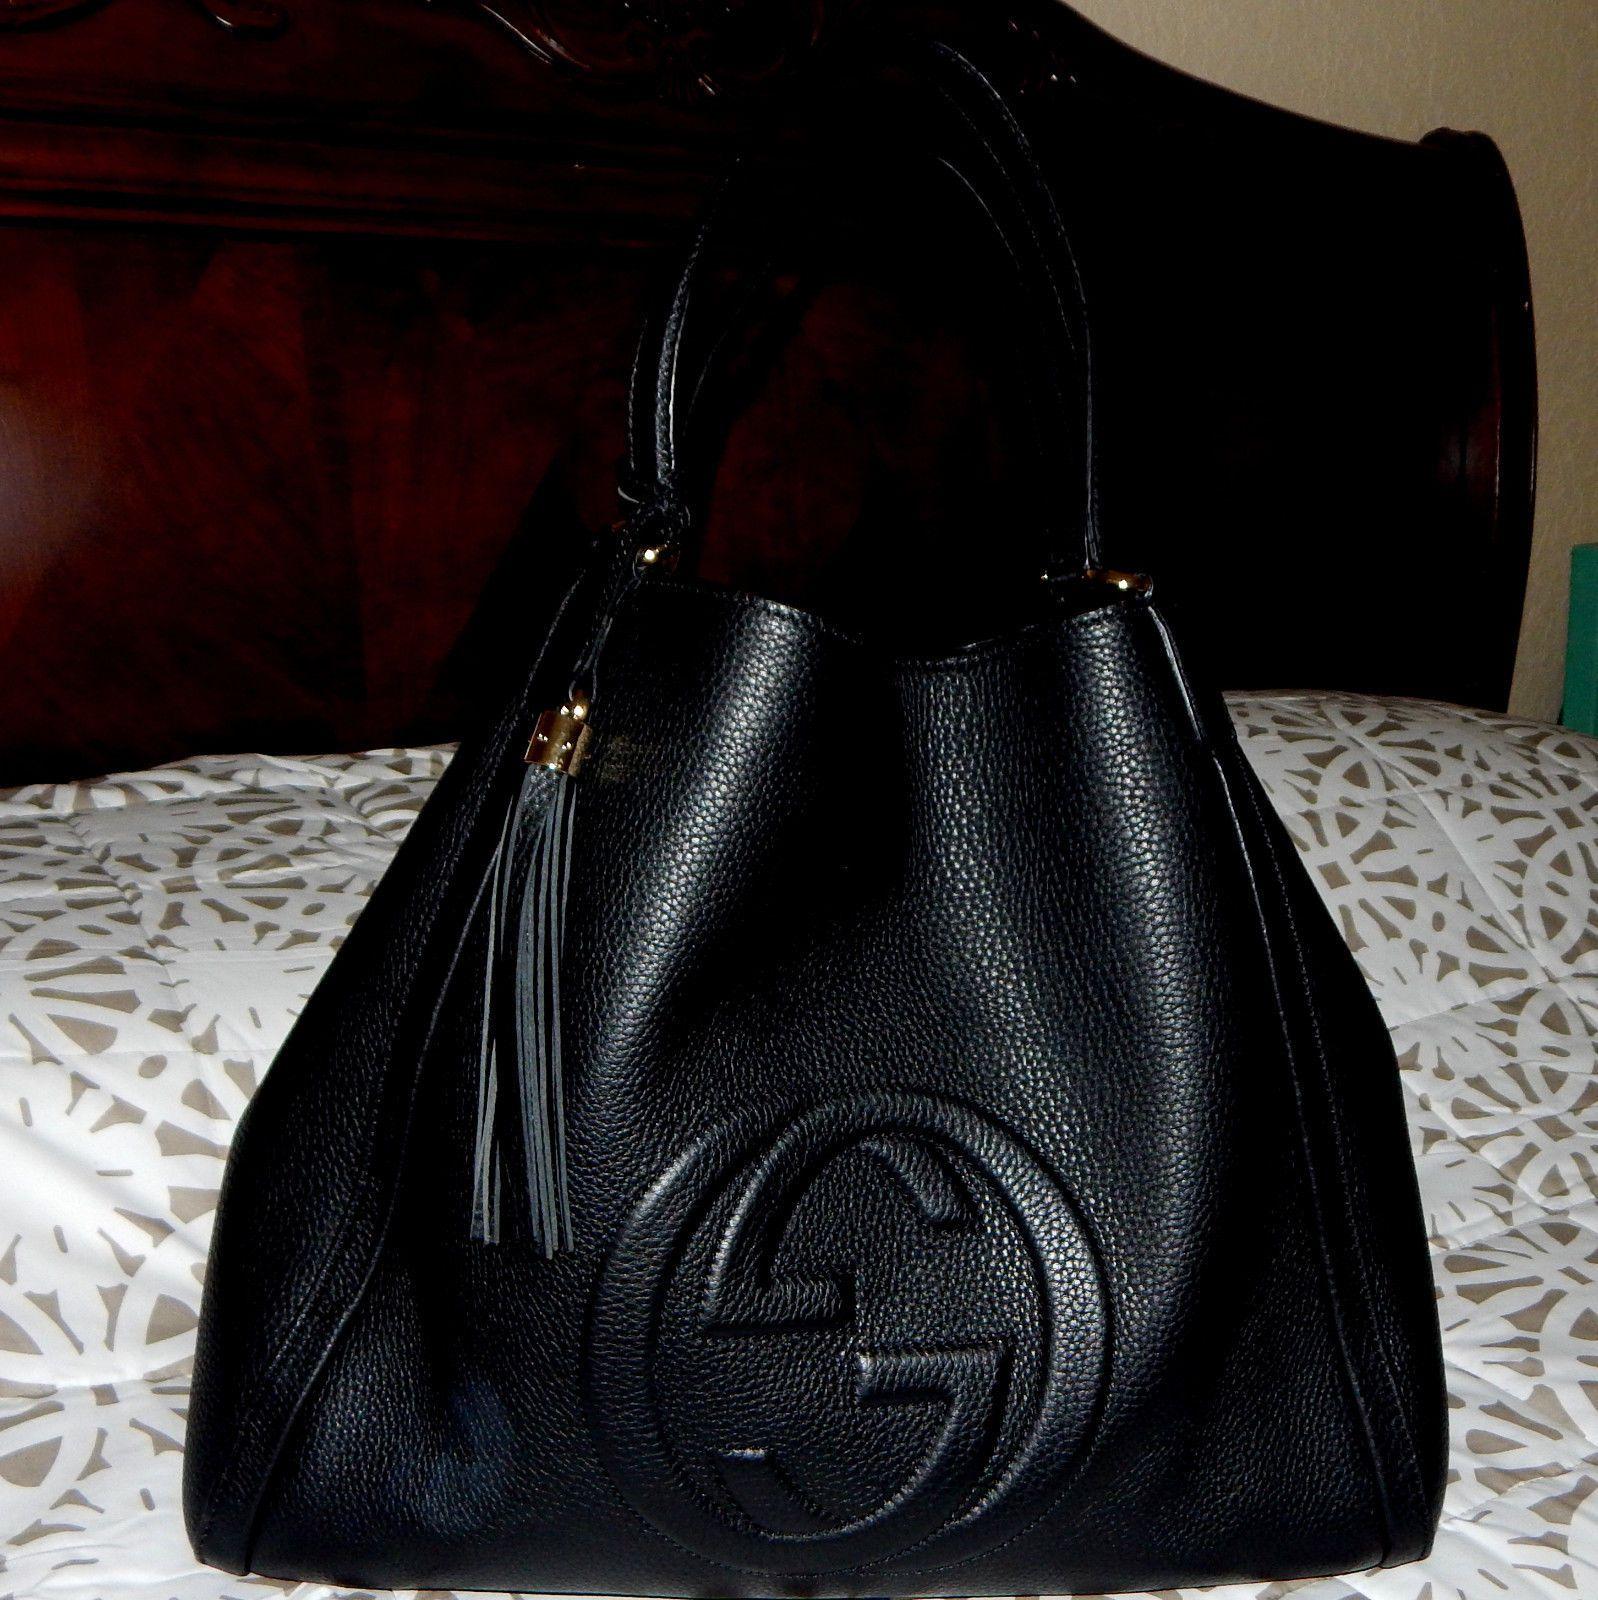 344682d1267 Details about AUTHENTIC GUCCI SOHO MEDIUM SHOULDER BAG IN BLACK ...